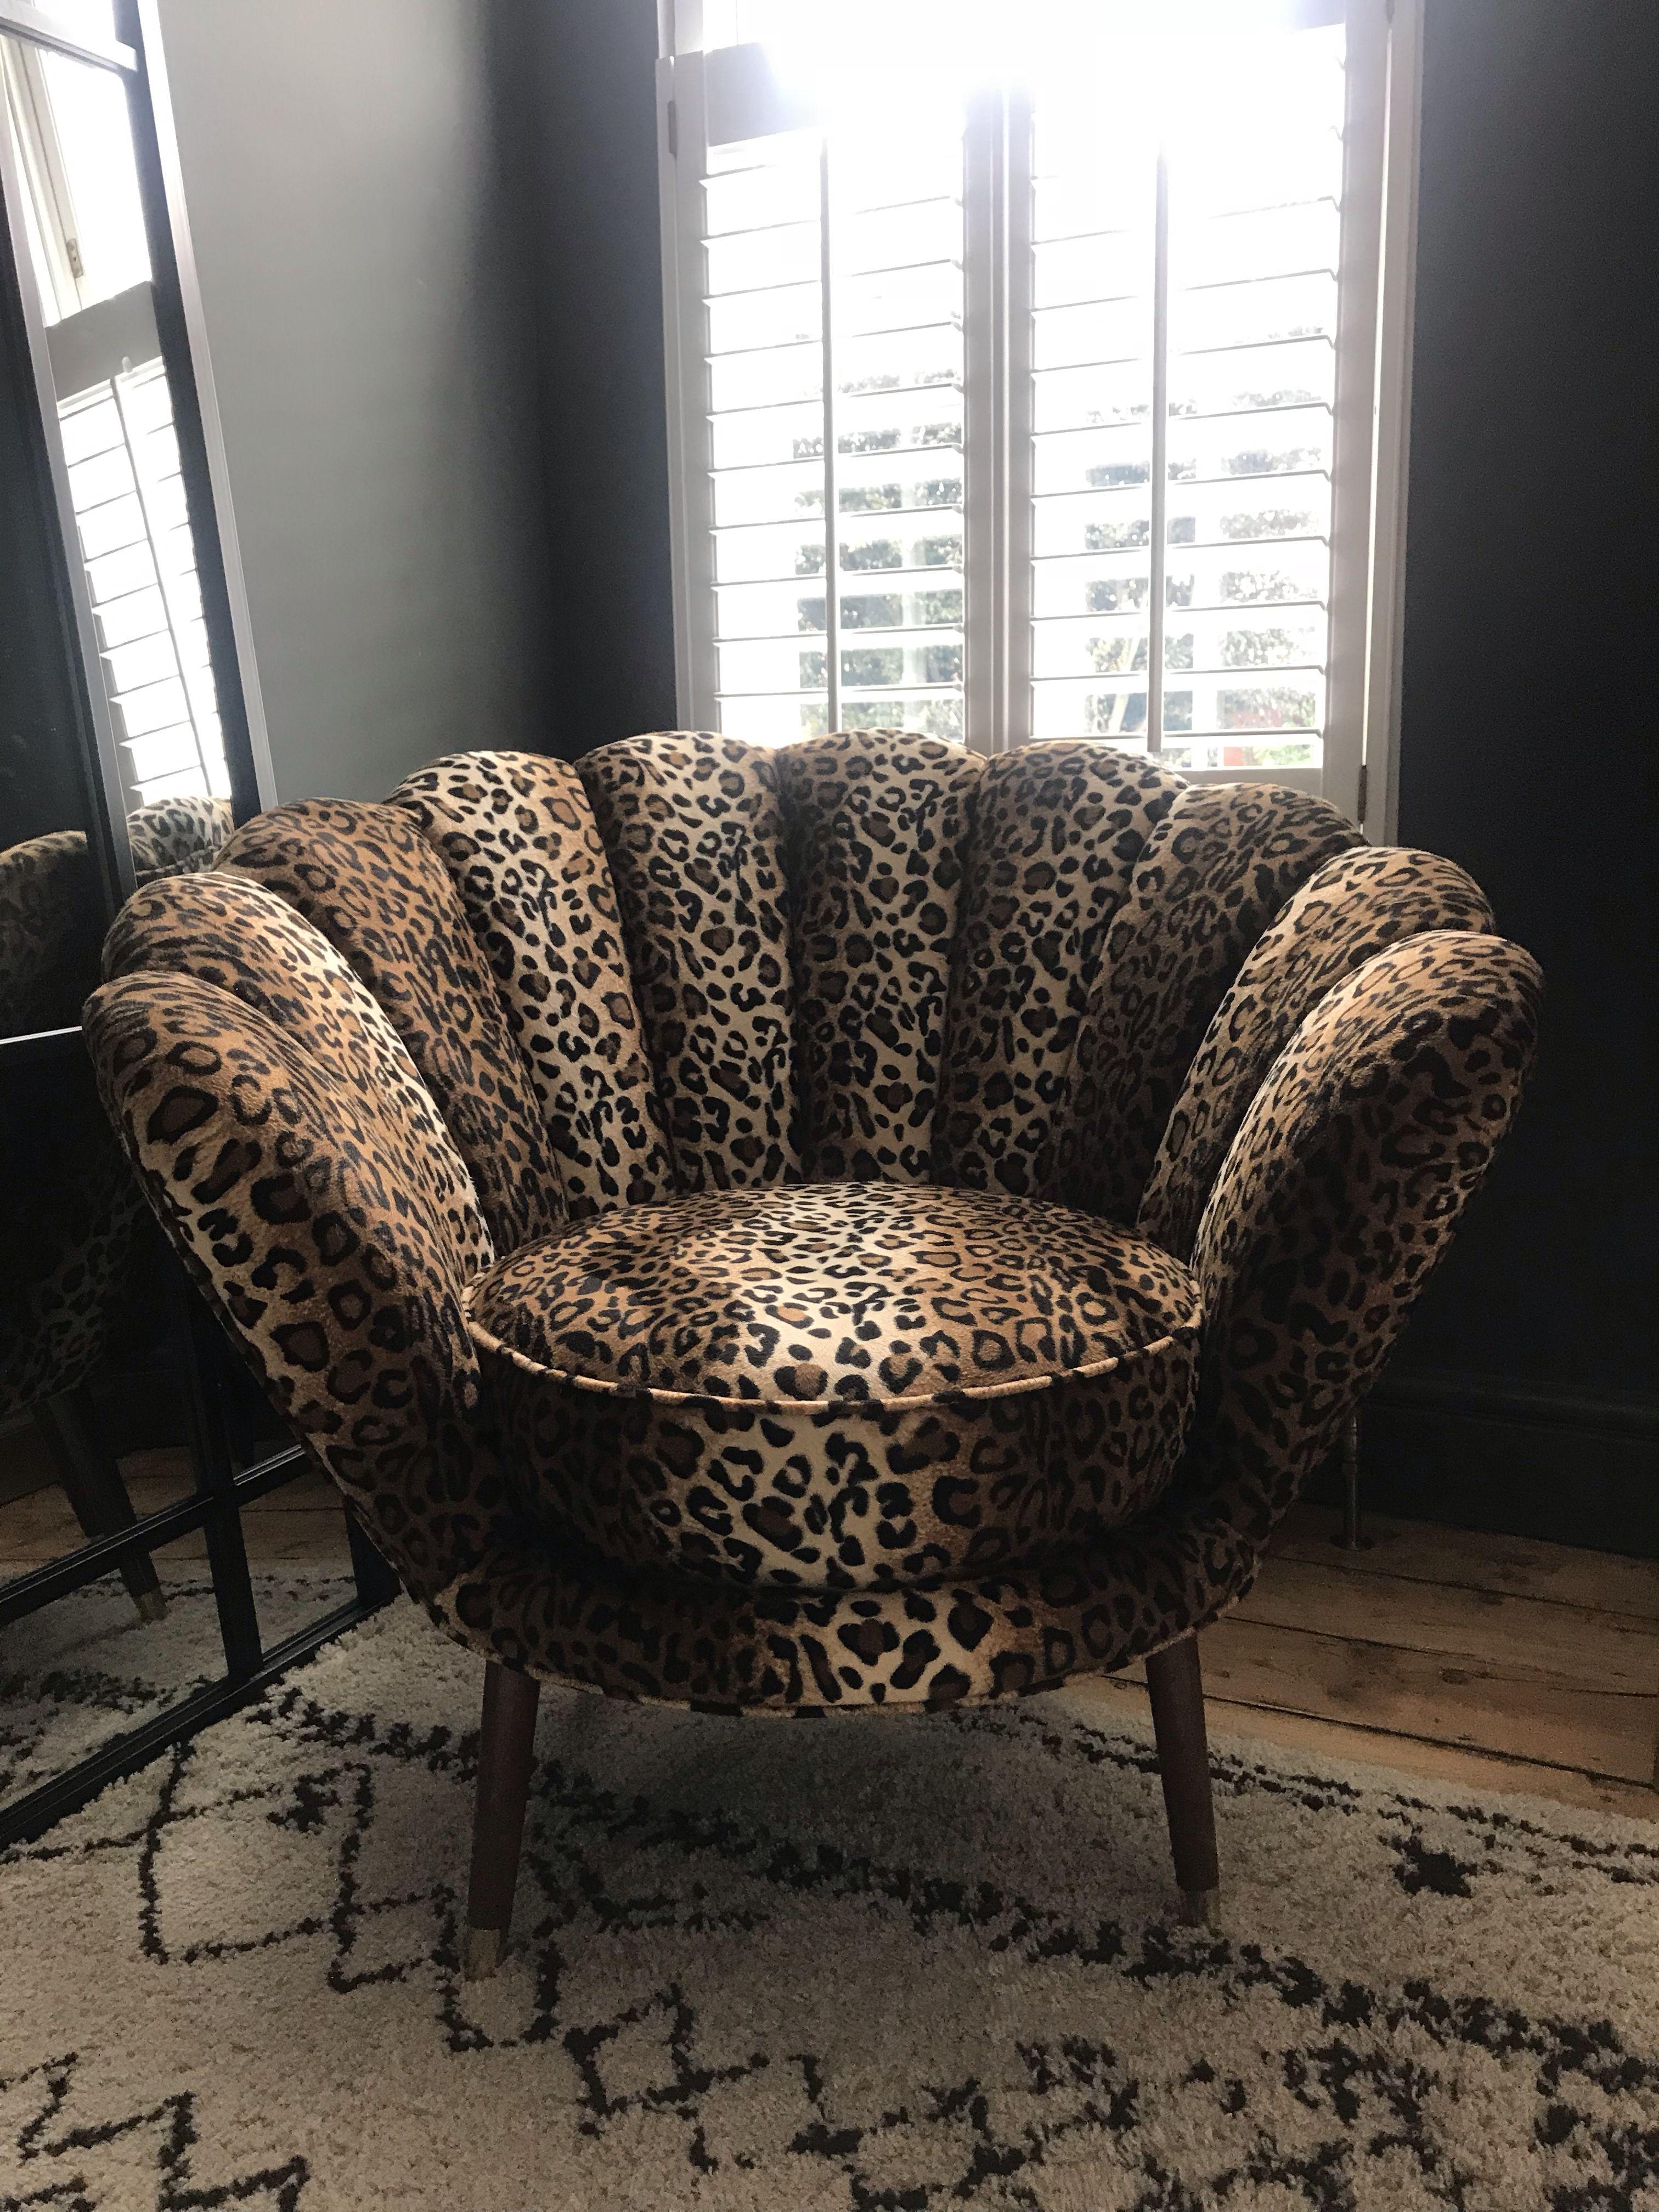 The Oyster Chair  Leopard print decor, Animal print decor, Animal